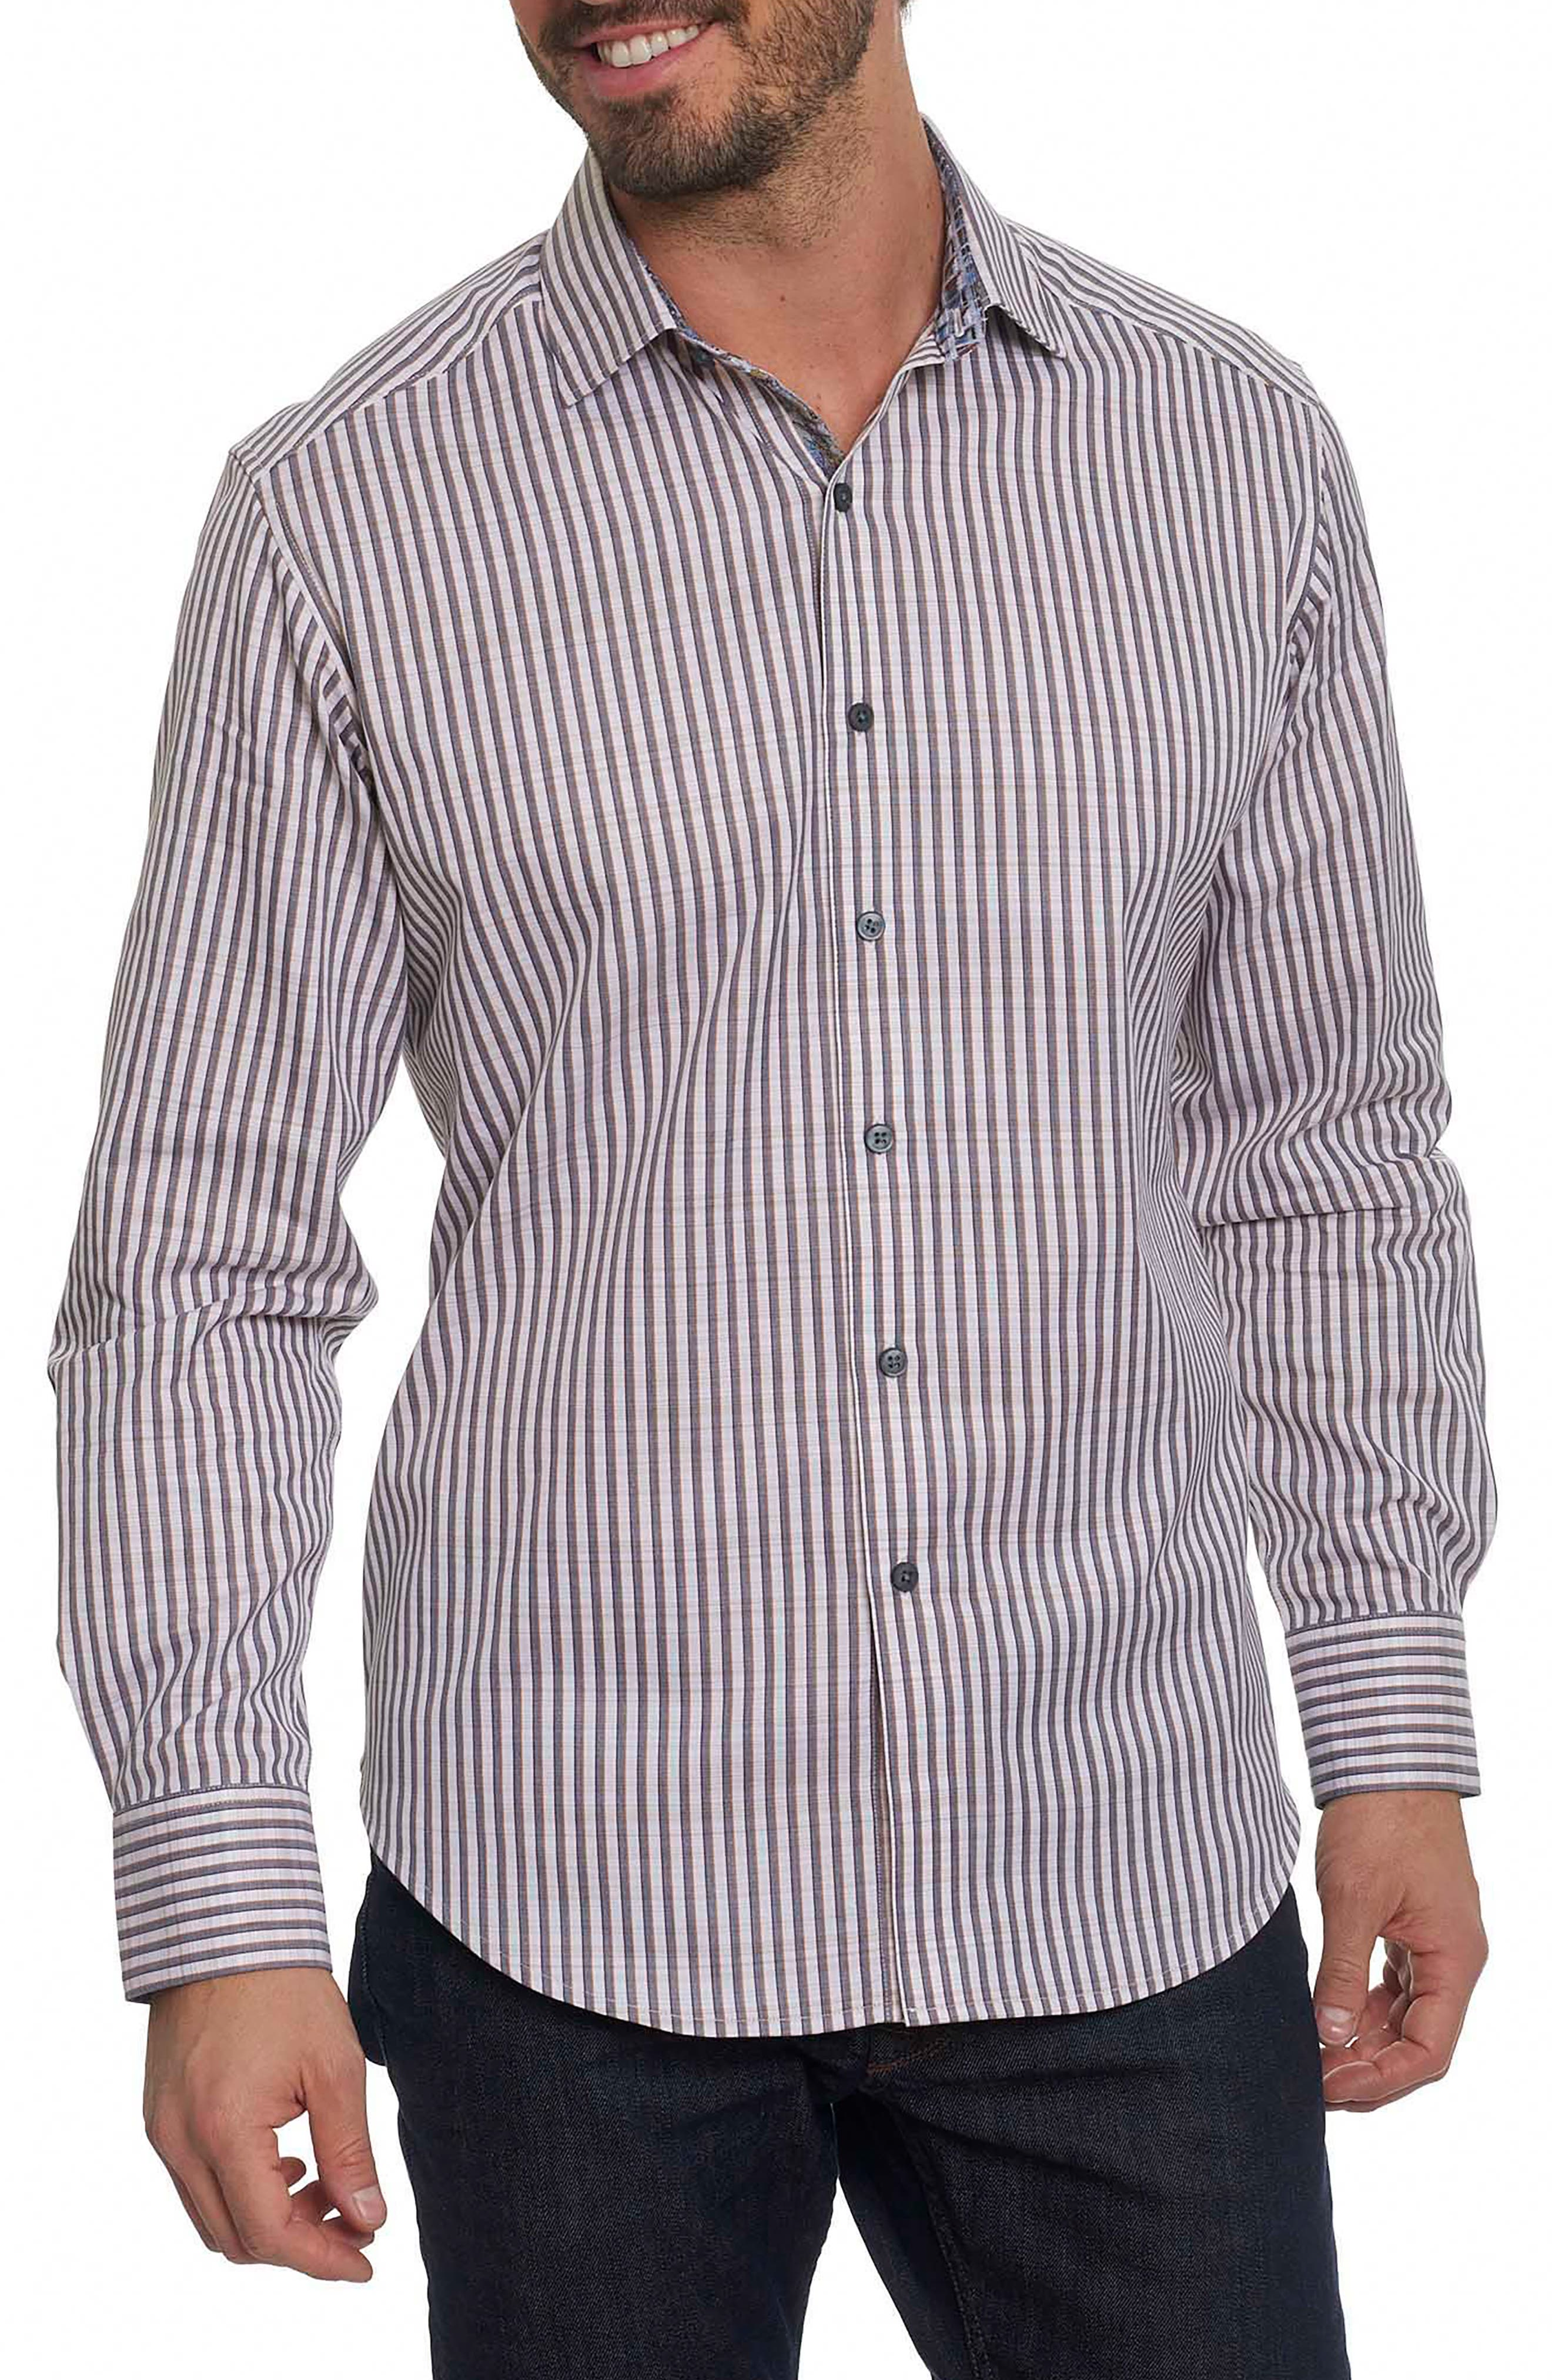 Marion Classic Fit Stripe Sport Shirt,                             Main thumbnail 1, color,                             Cream